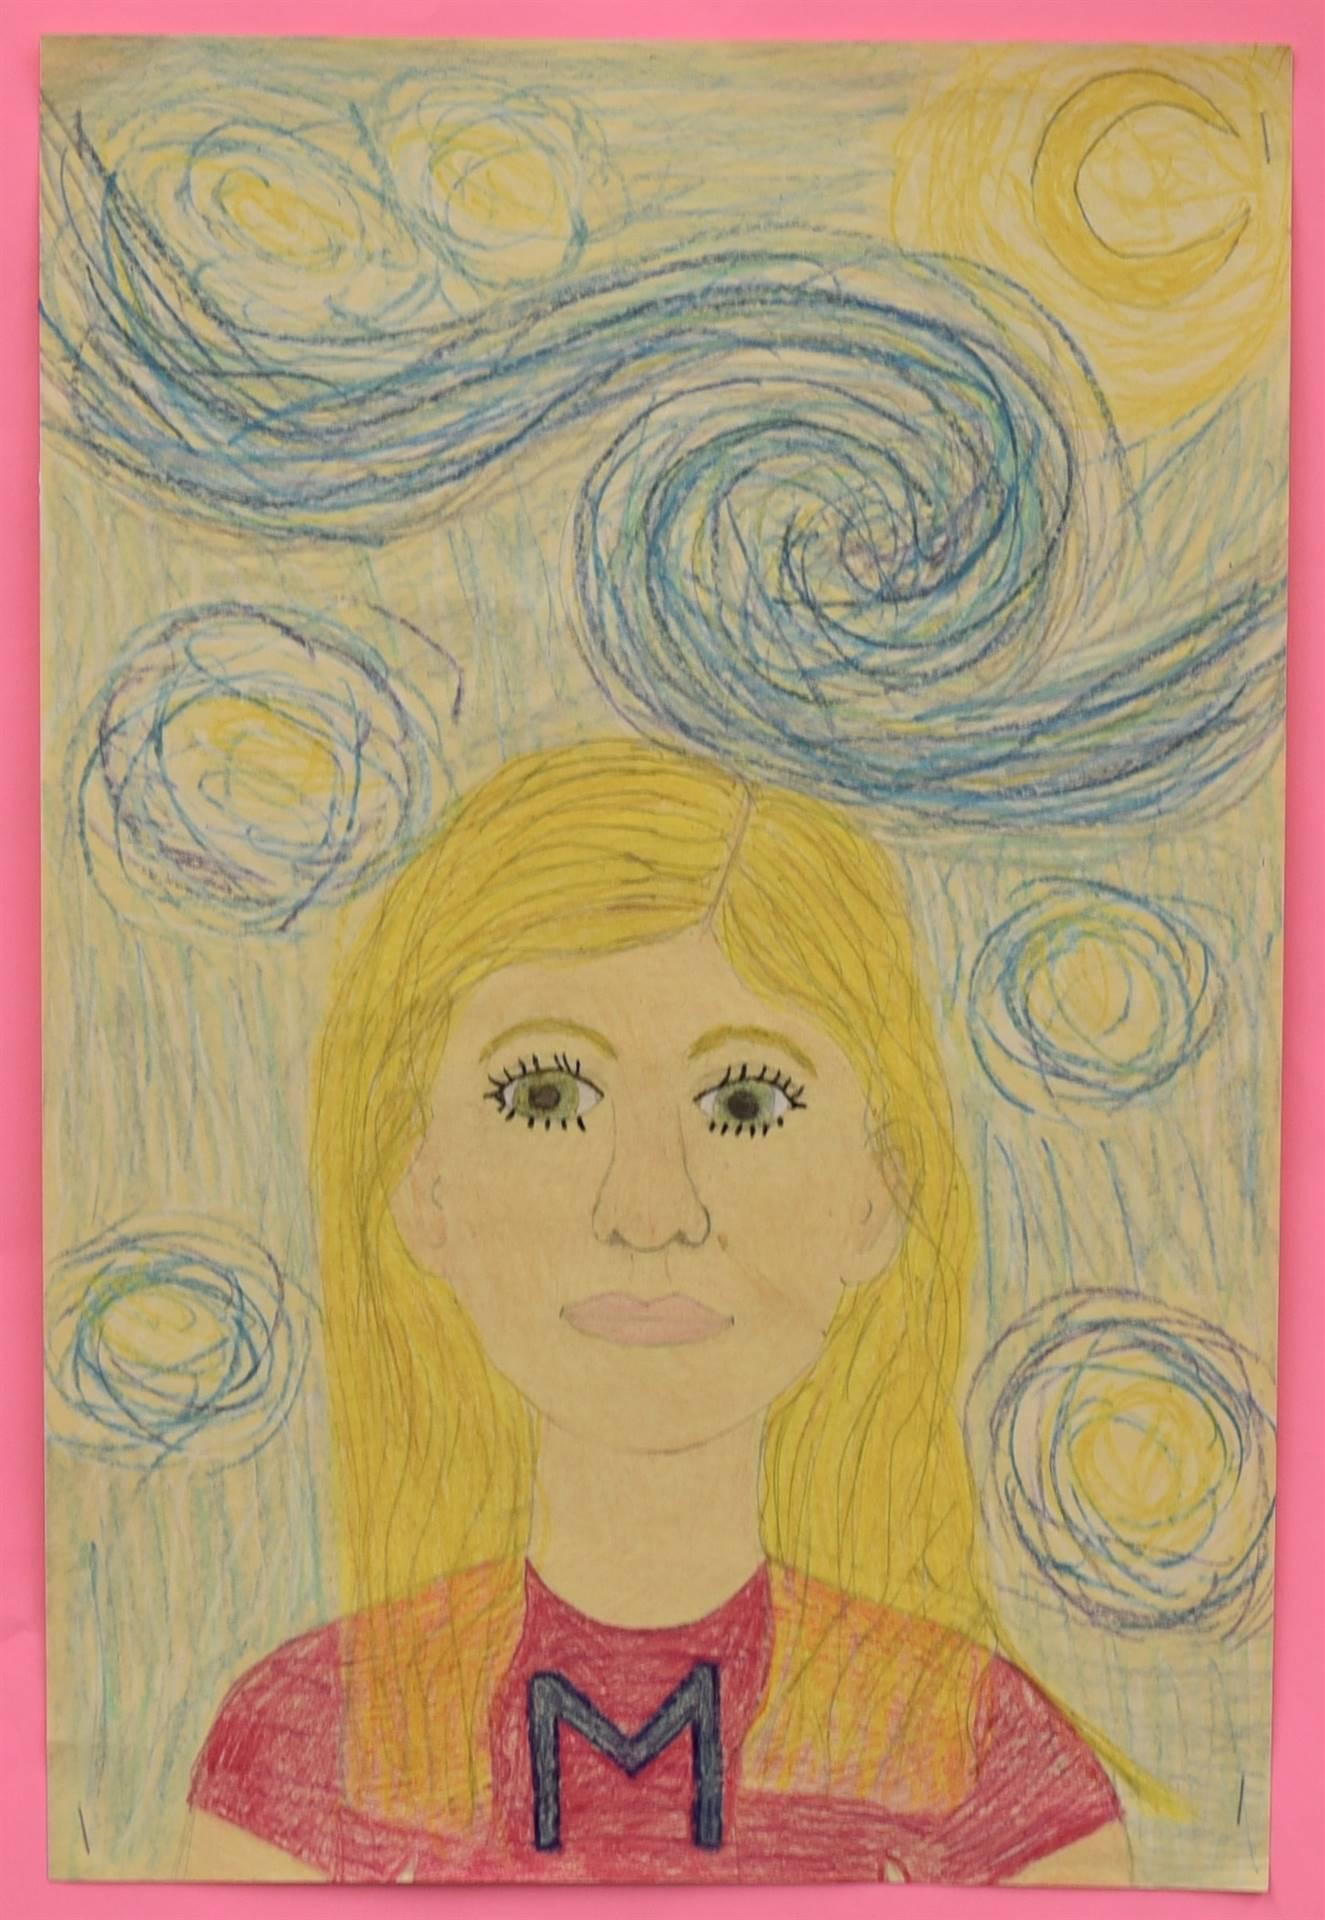 Brecksville-Broadview Hts. Middle School Art Projects 184